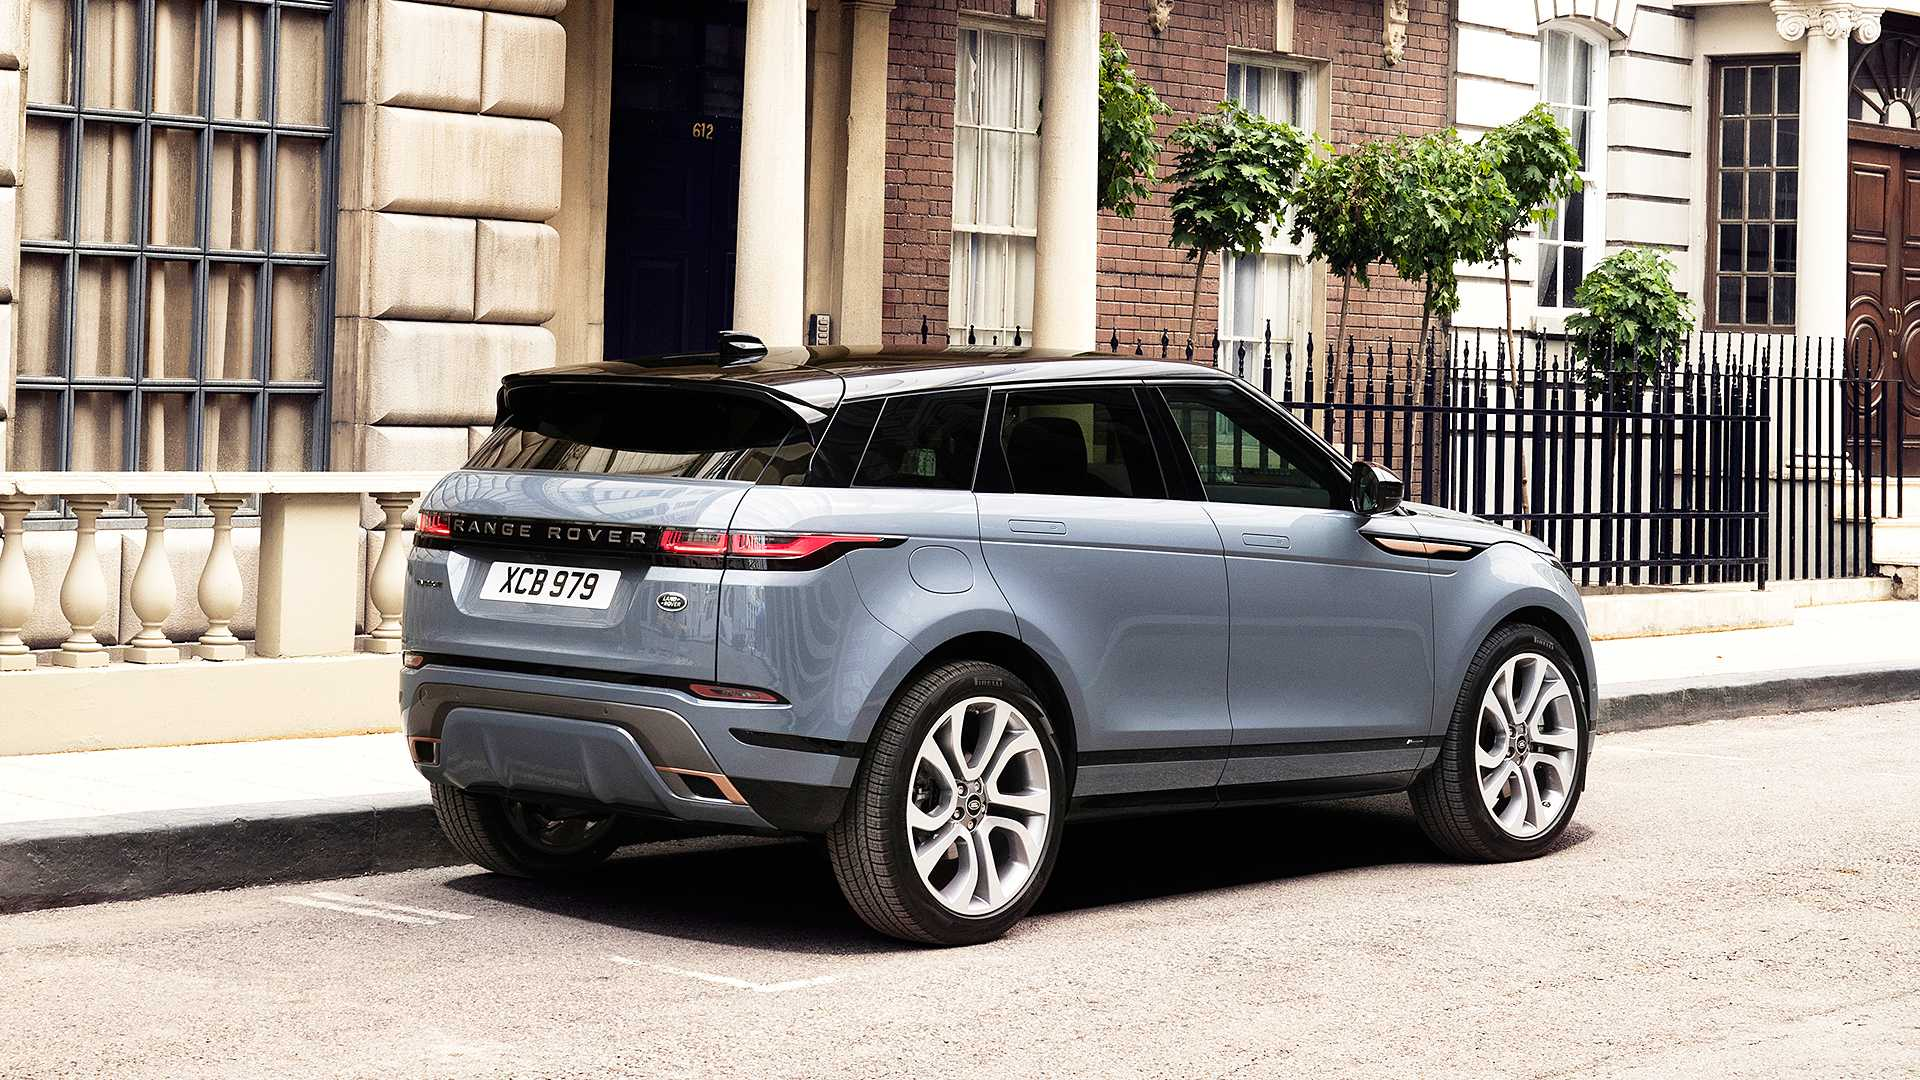 2020-range-rover-evoque (60)